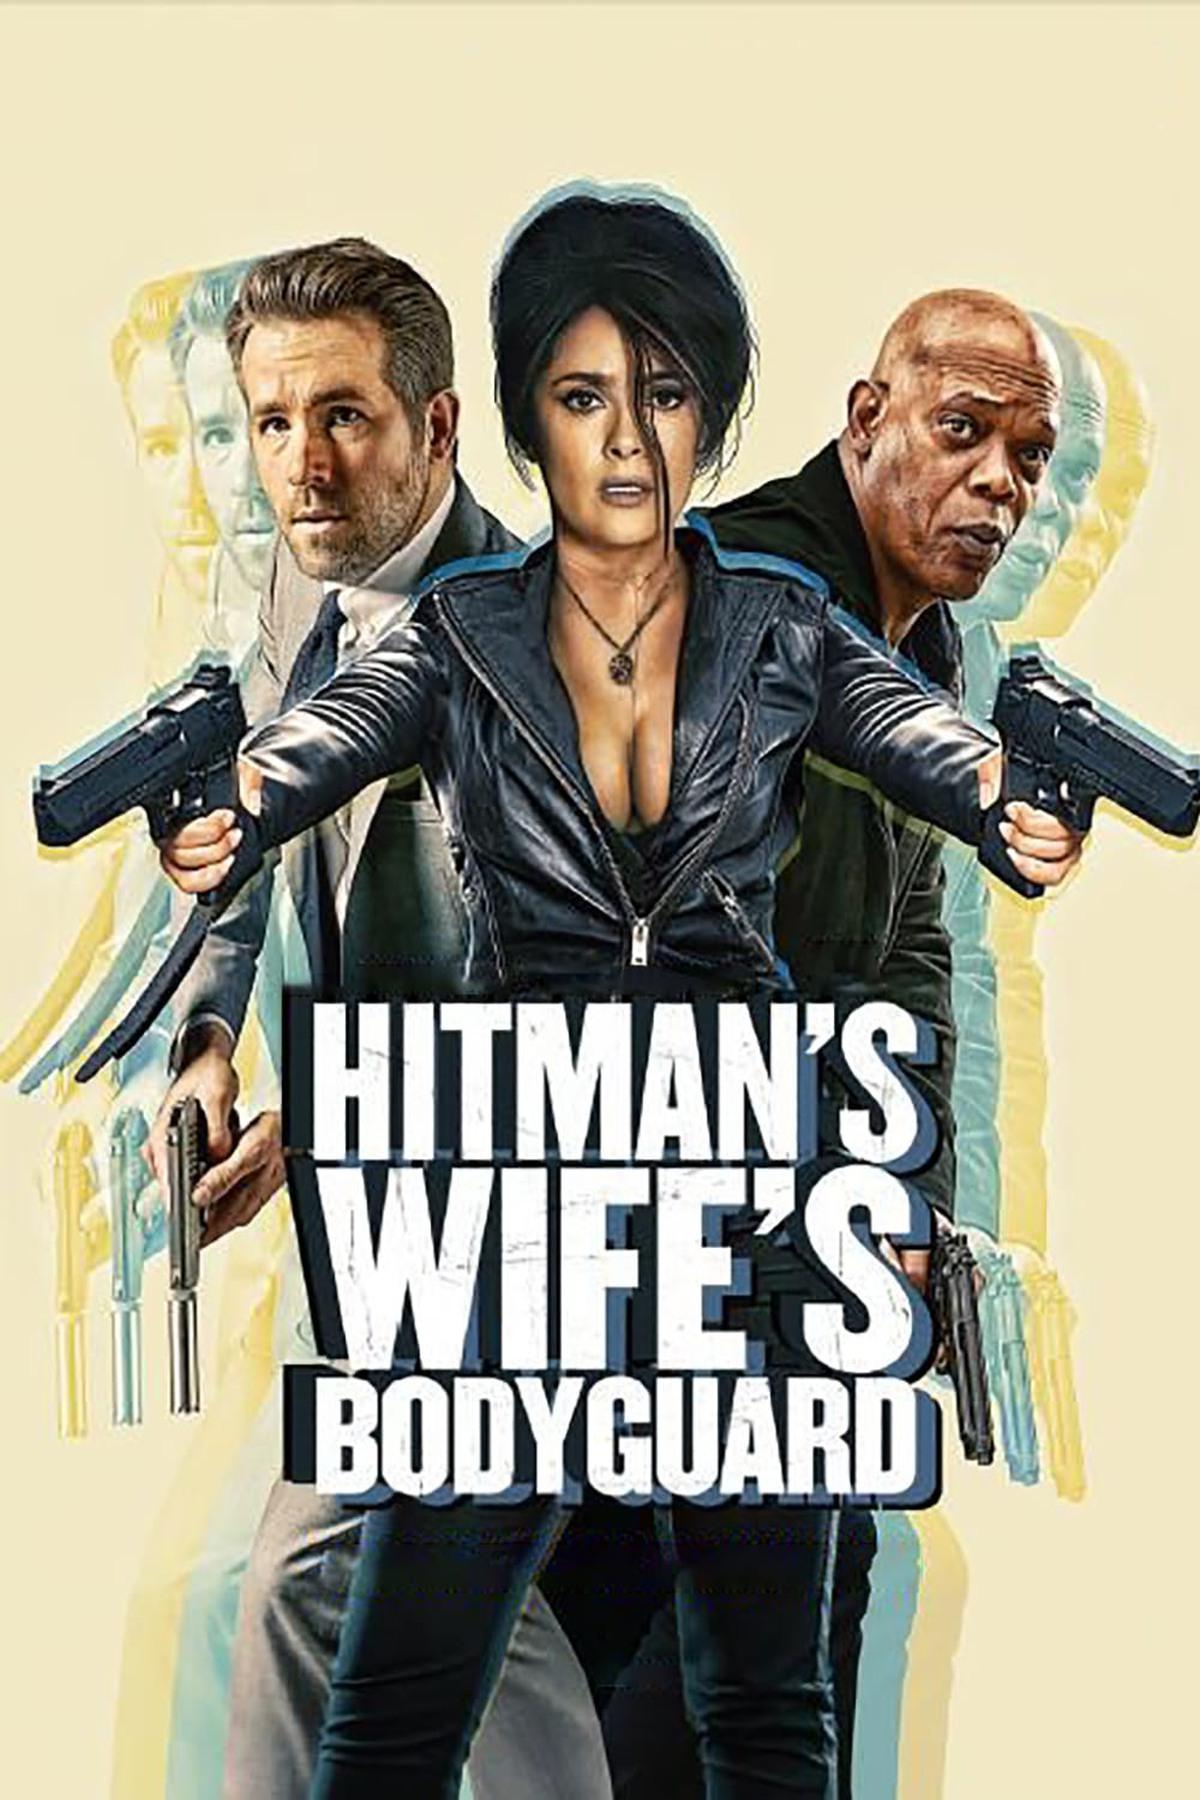 Killers Bodyguard 2 Teaser Poster 1